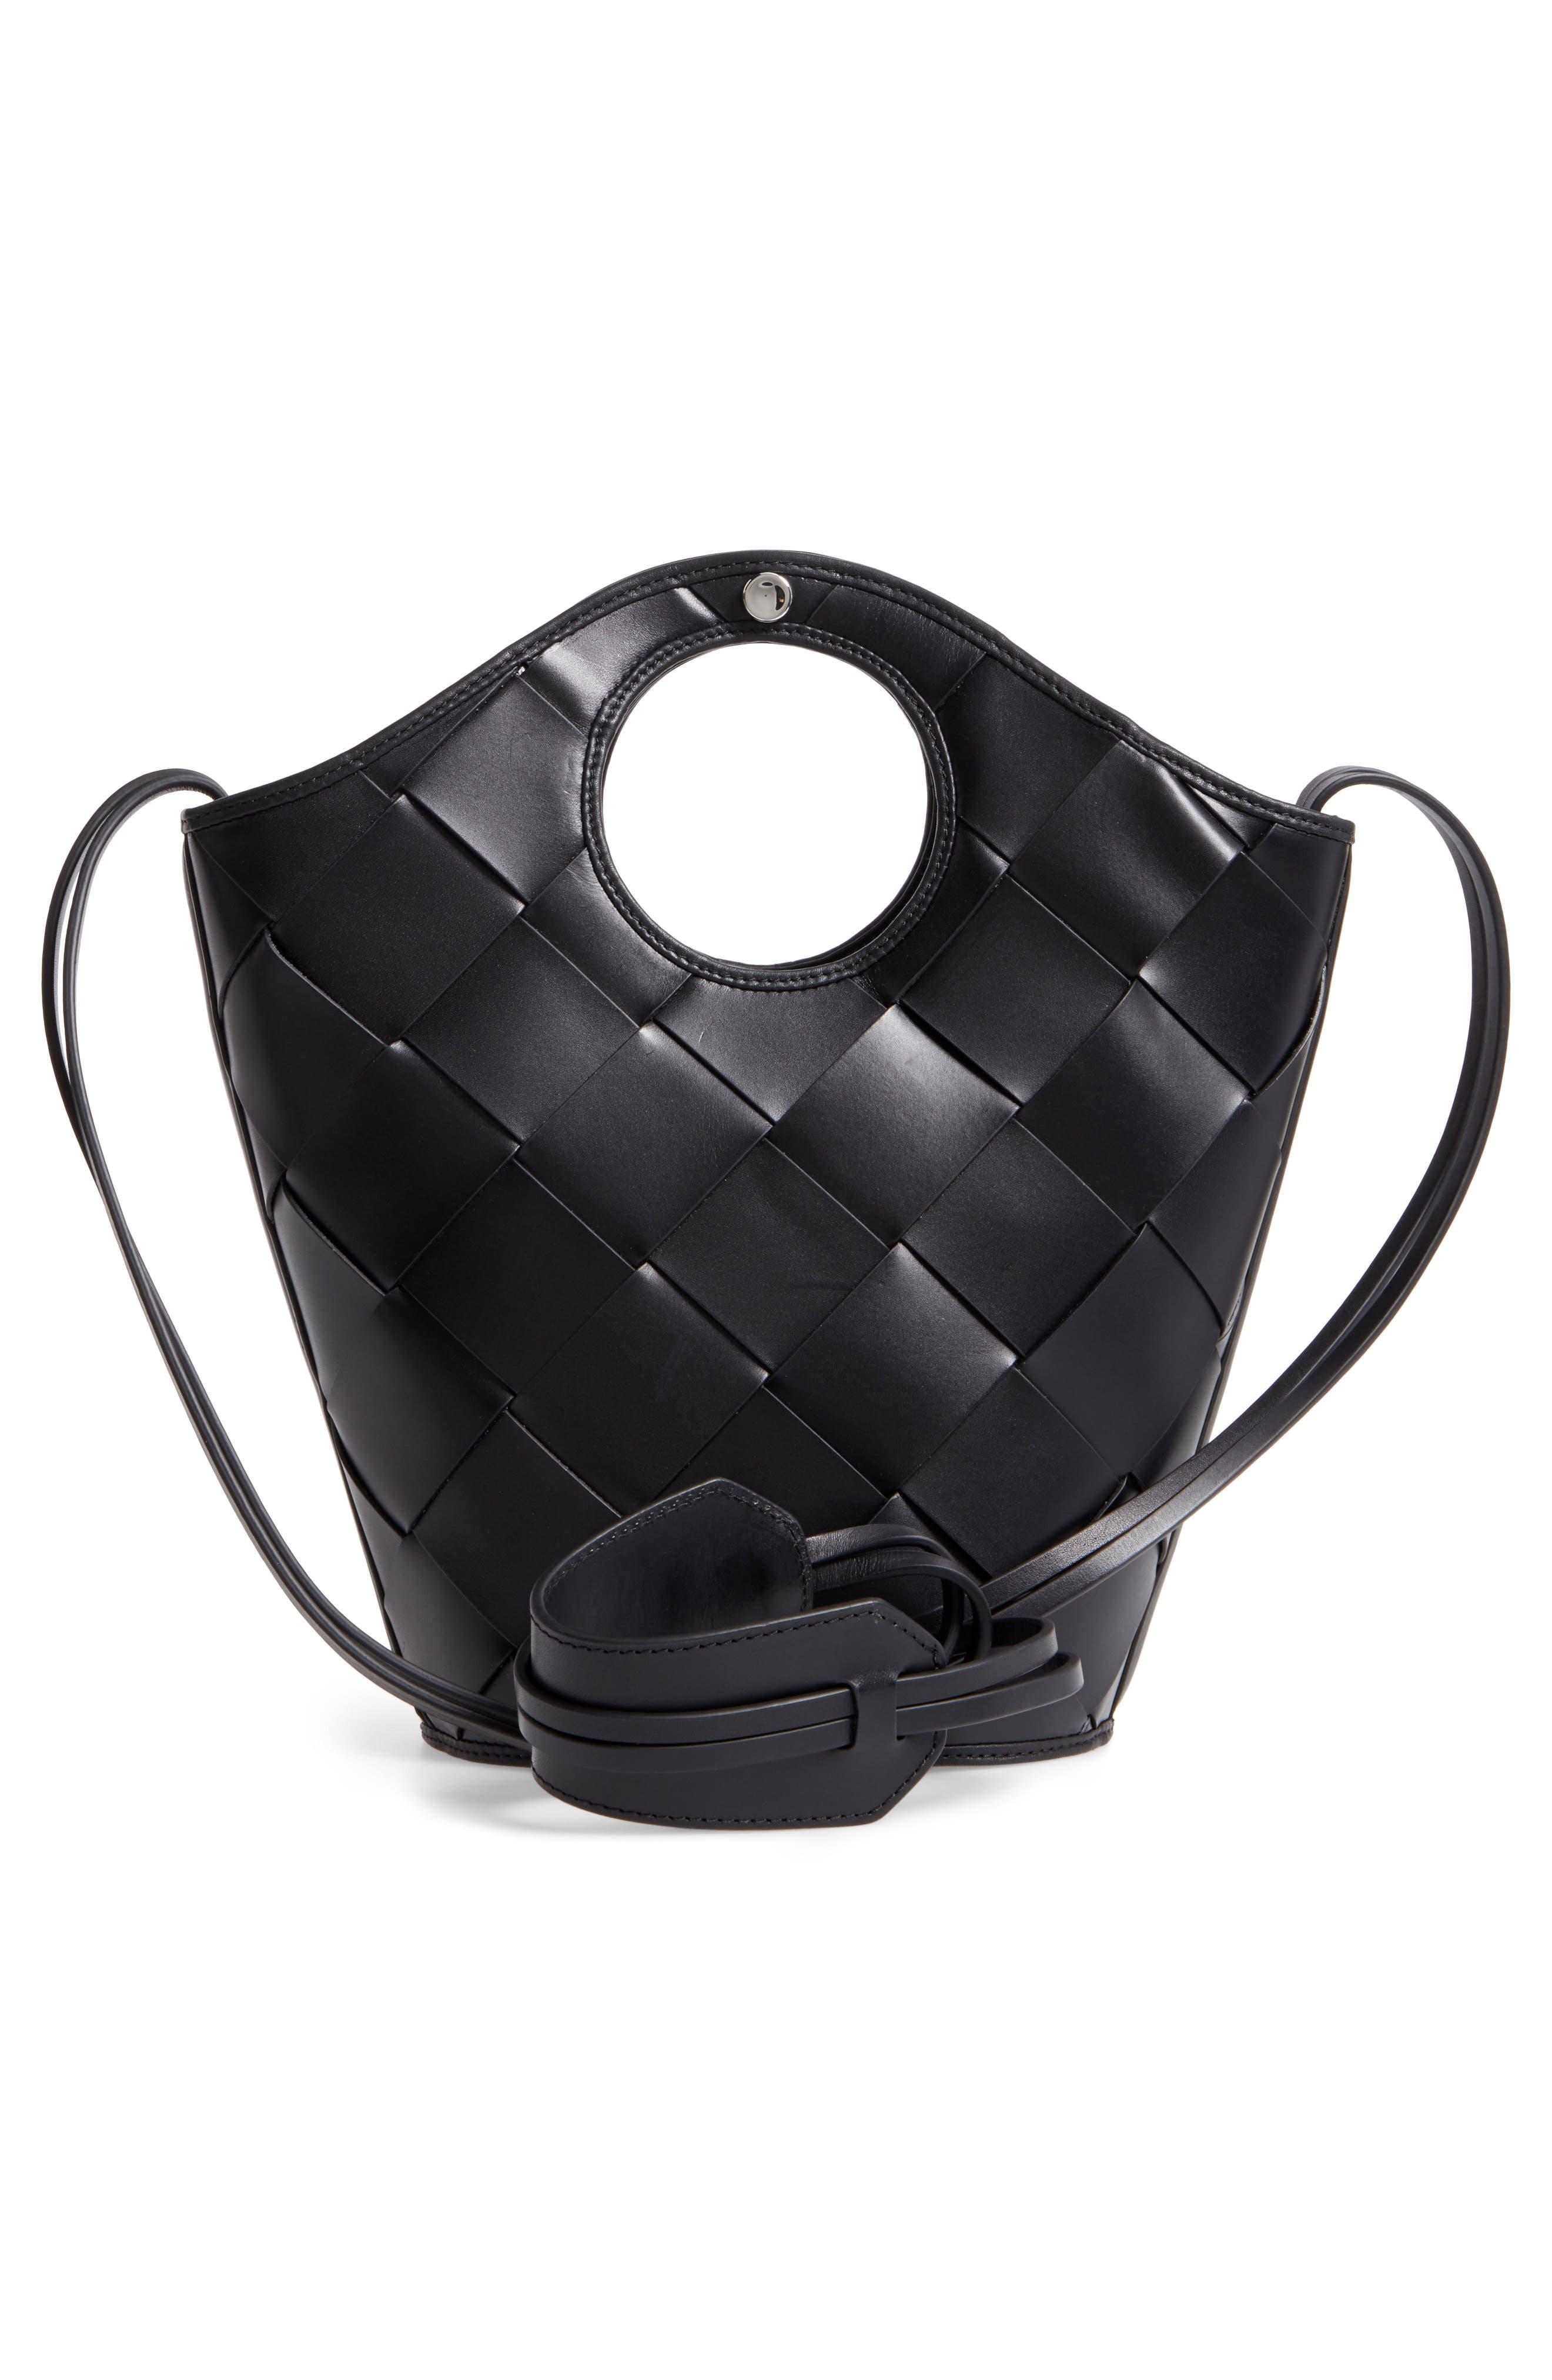 Small Market Woven Leather Crossbody Shopper,                             Alternate thumbnail 3, color,                             Black